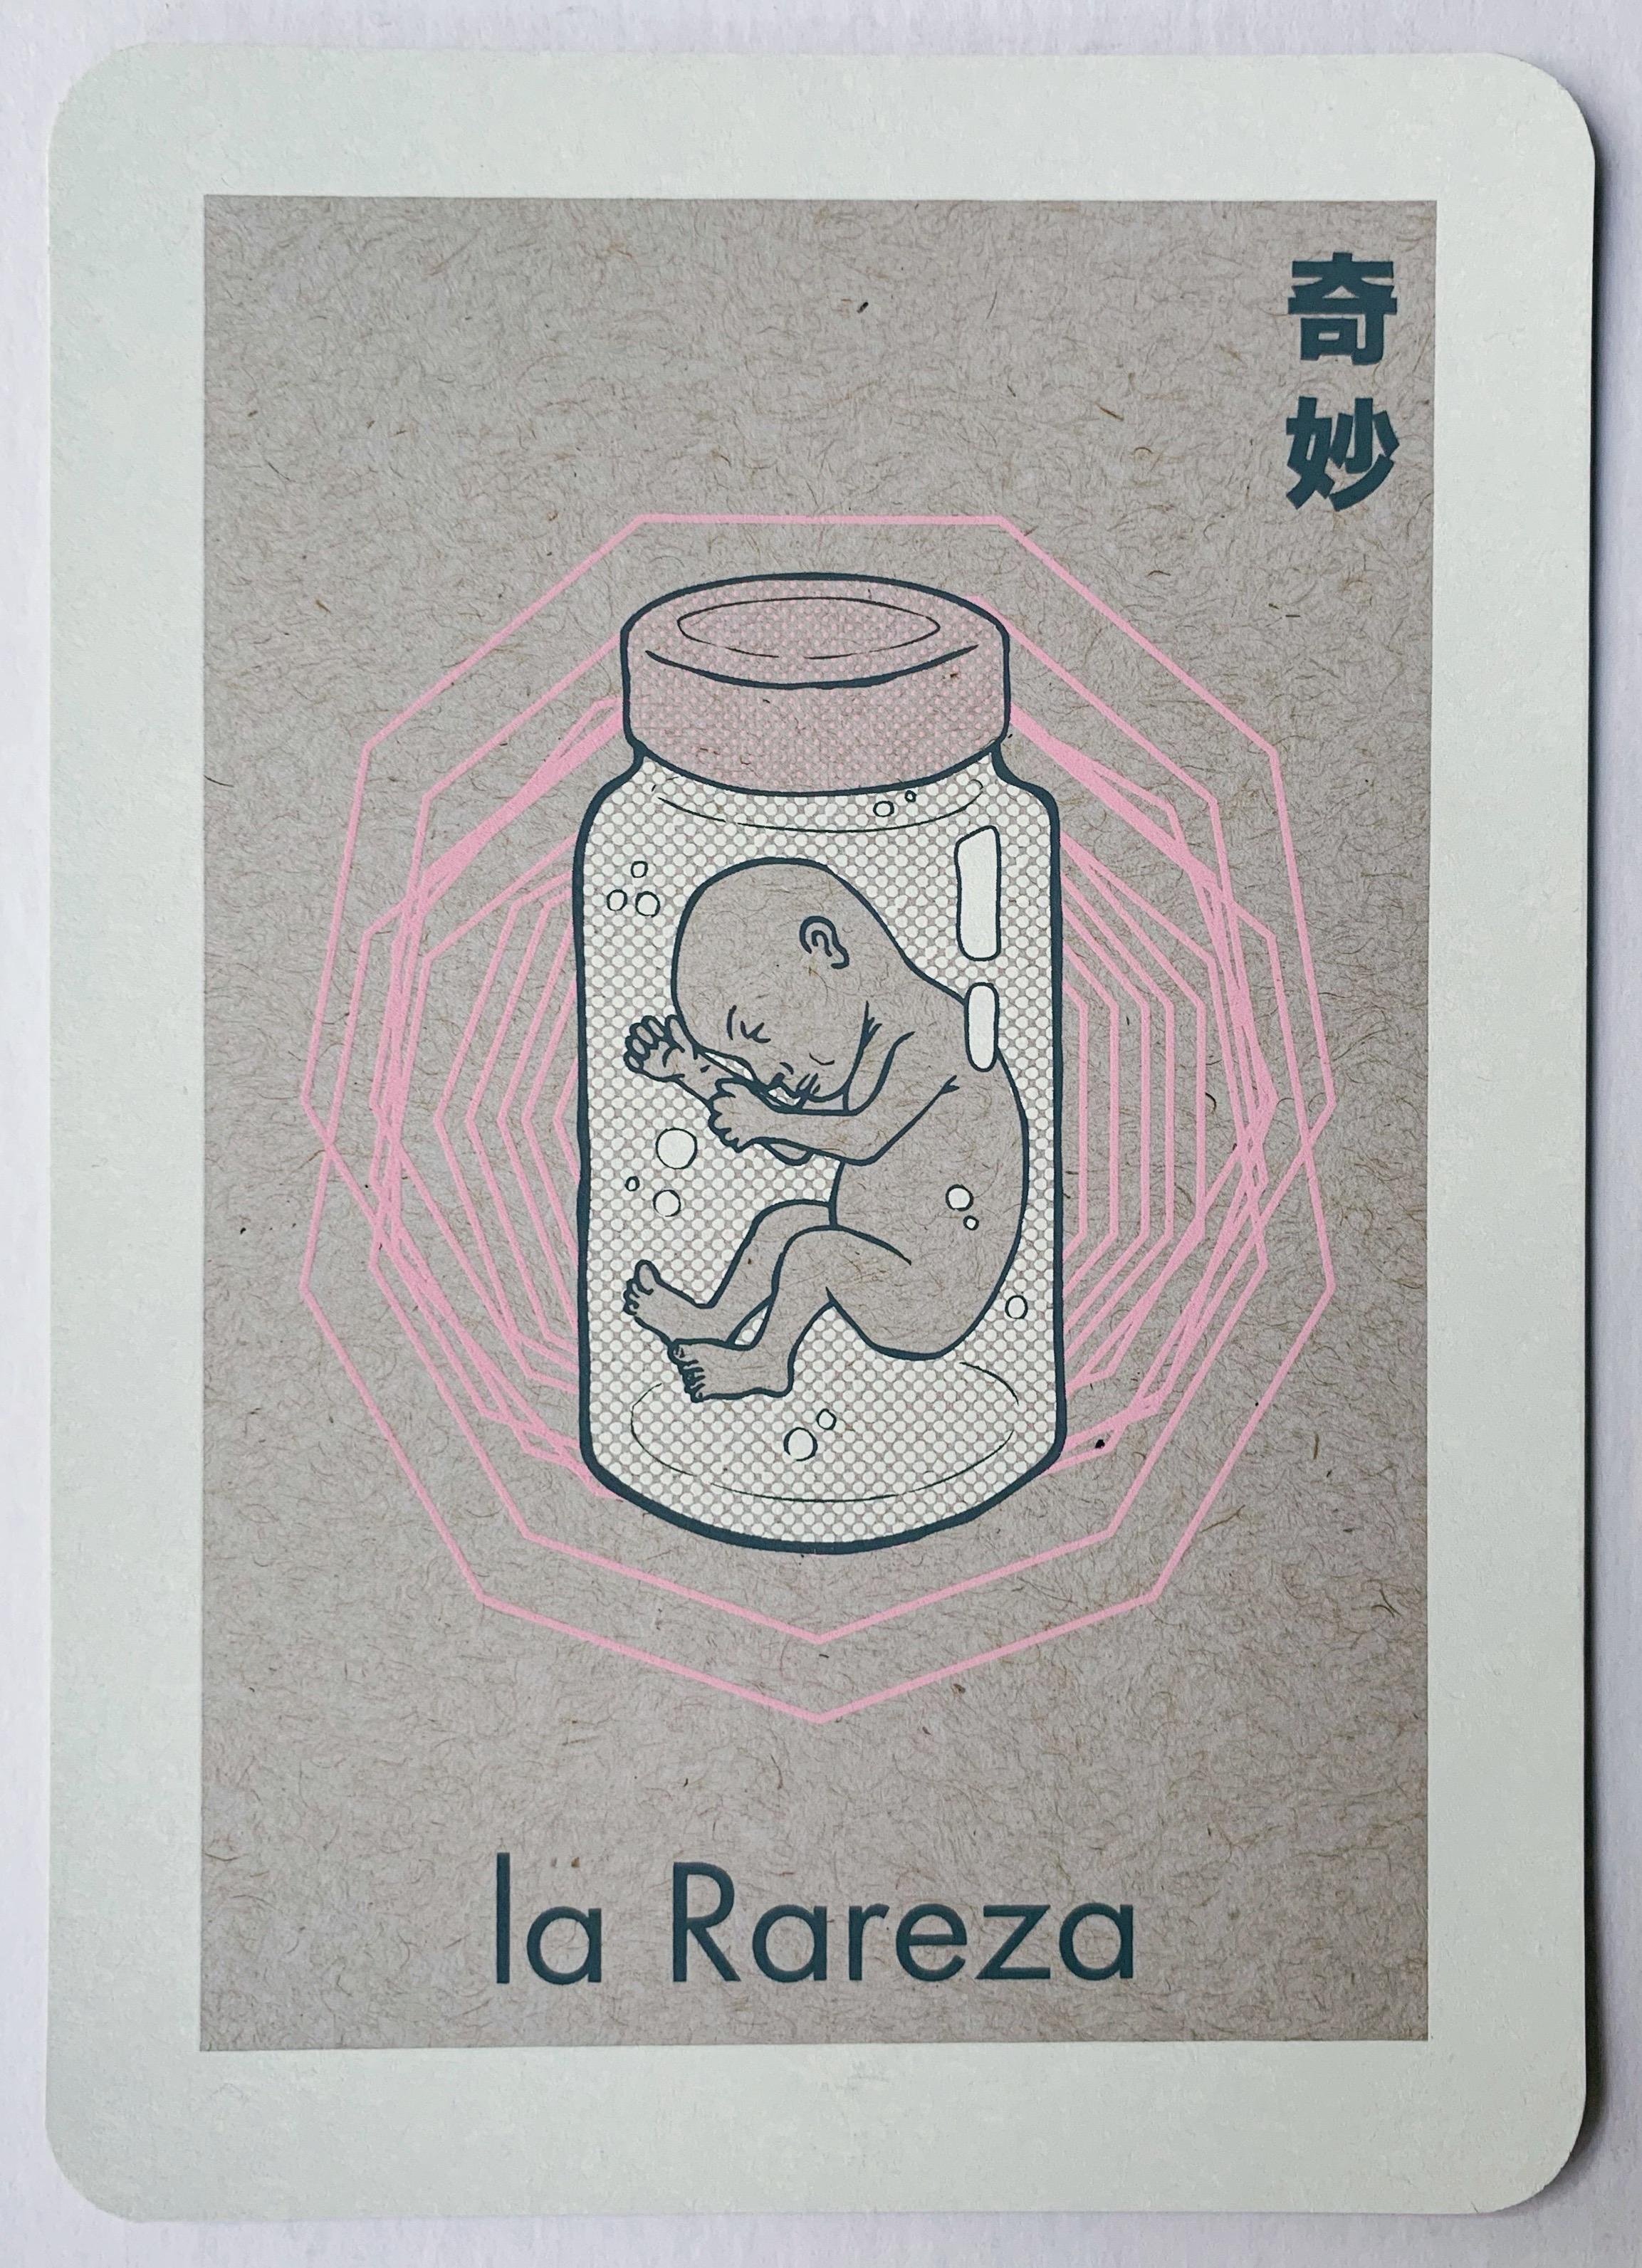 la Rareza, serigraphy, 2017